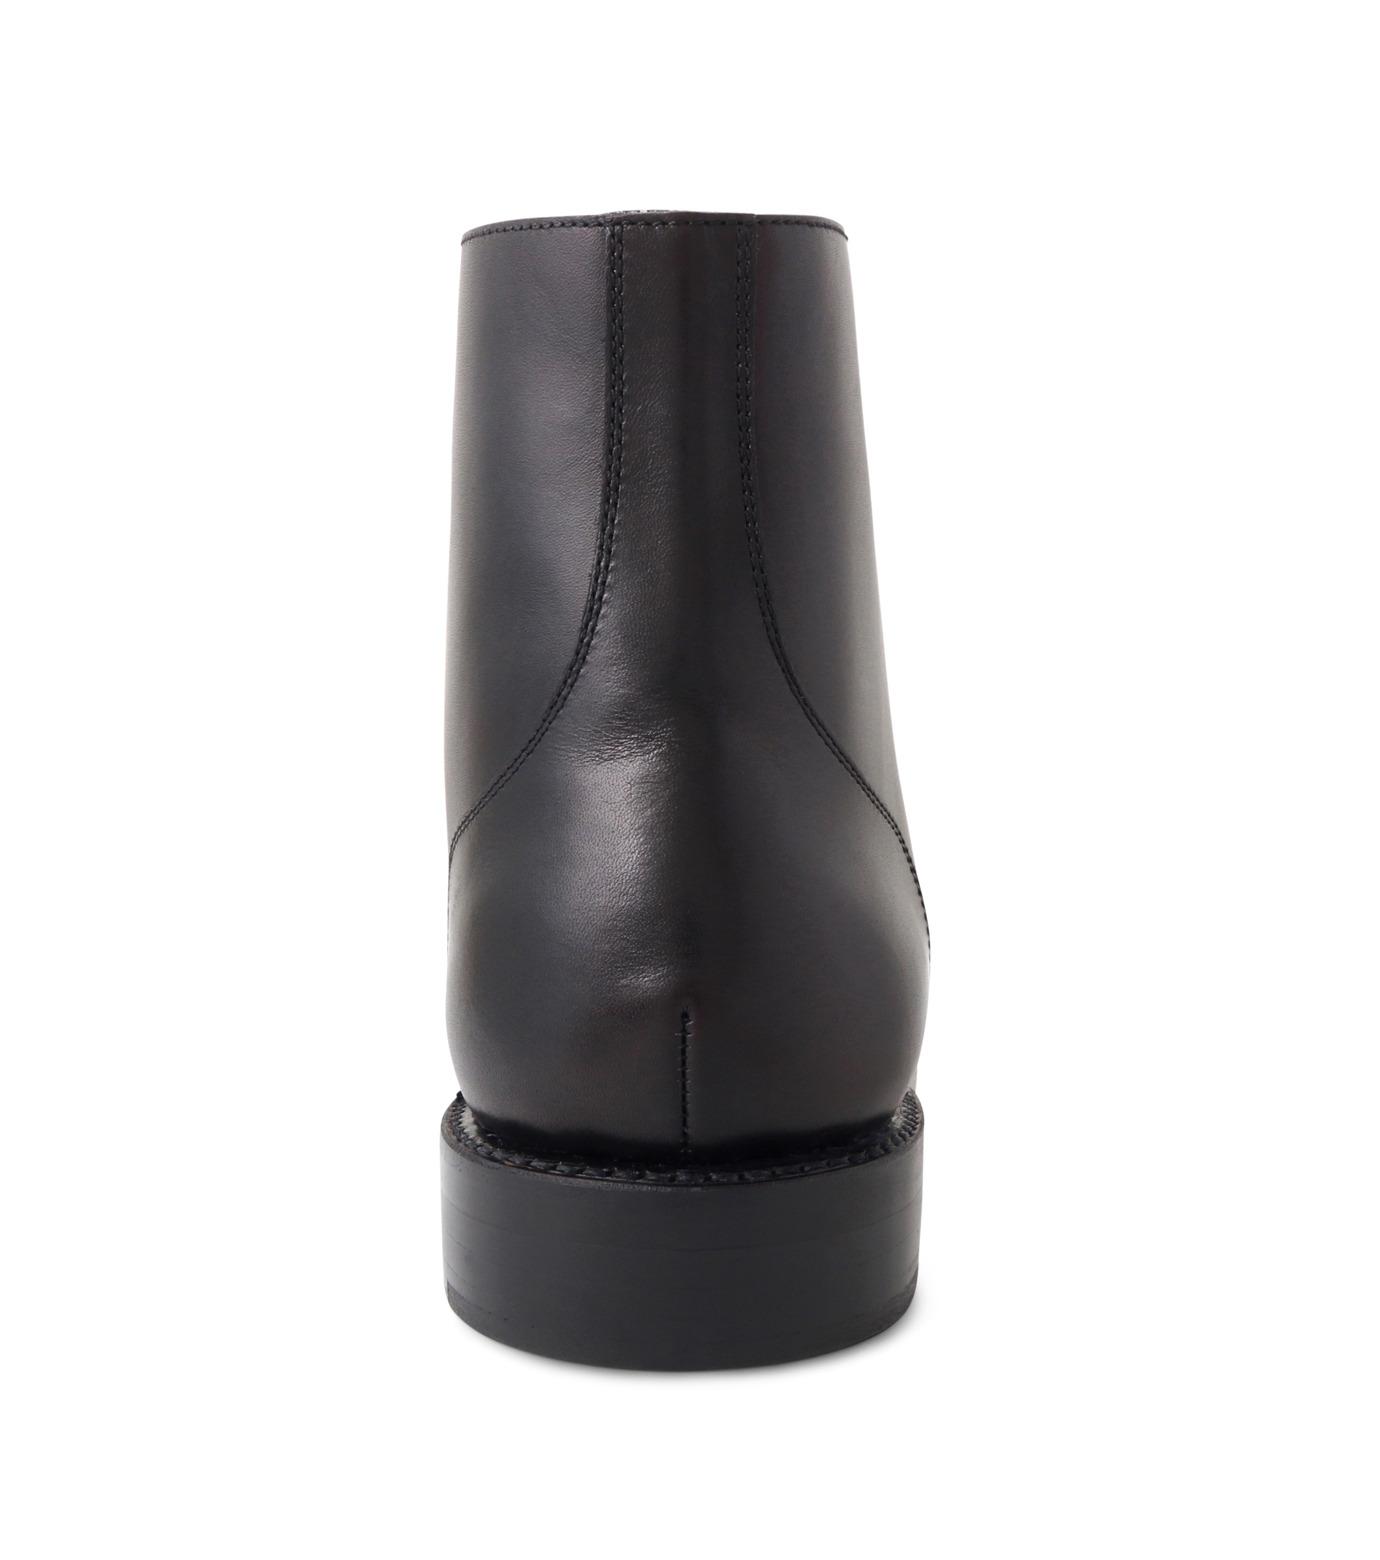 RAINMAKER(レインメーカー)のm42 boots-BLACK(ブーツ/boots)-RM162-019-13 拡大詳細画像2